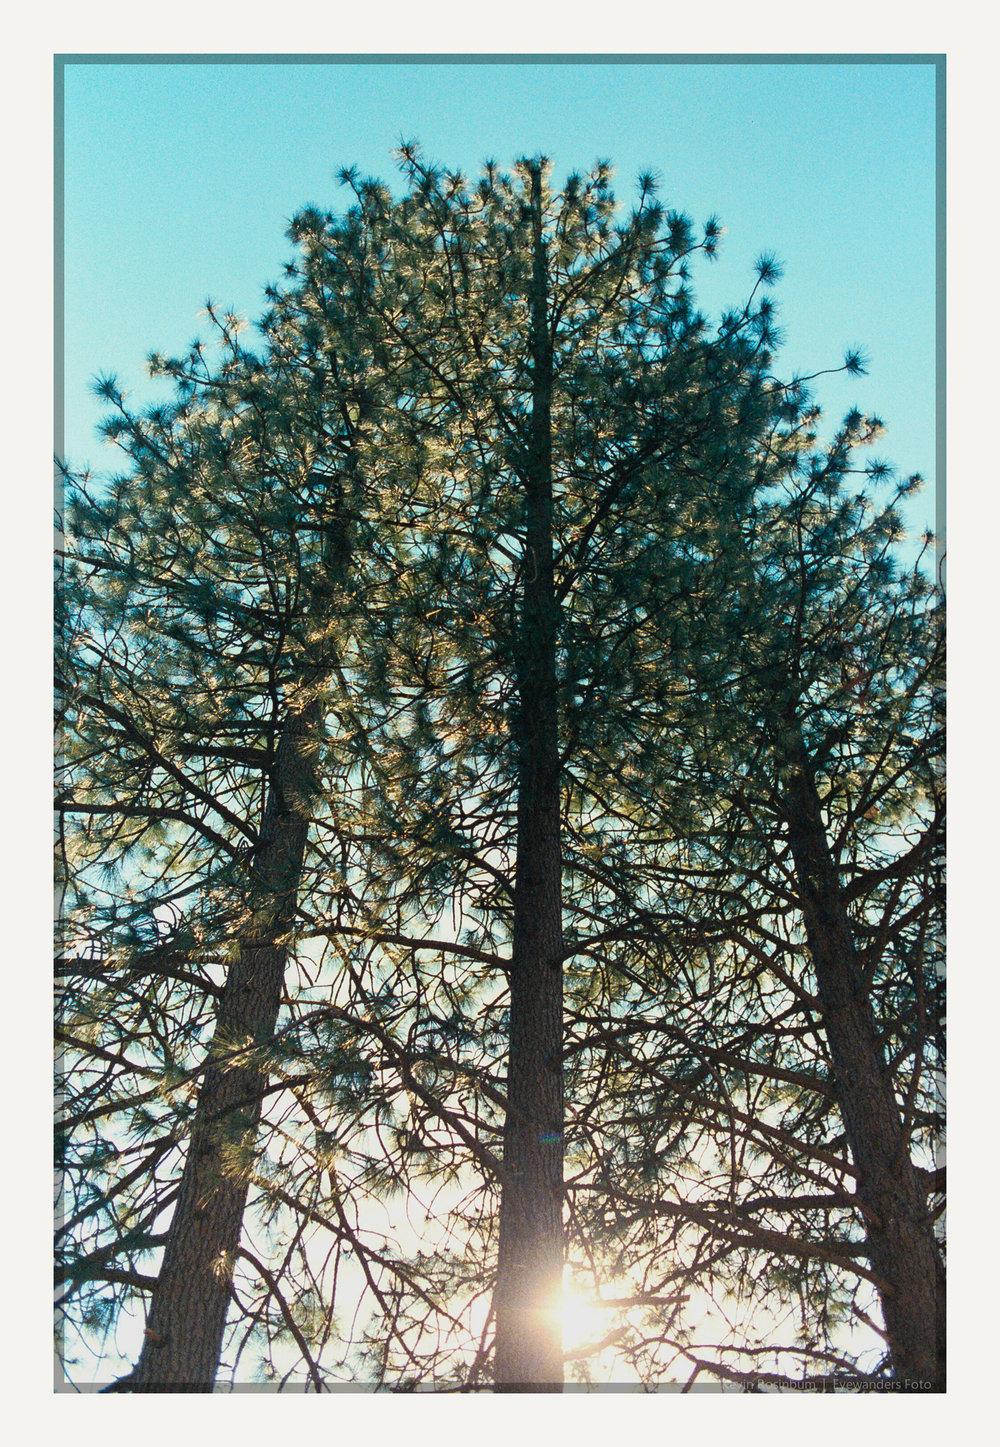 pillars | Pentax MZ3 35mm | Lomo F2 400 | Kevin Rosinbum